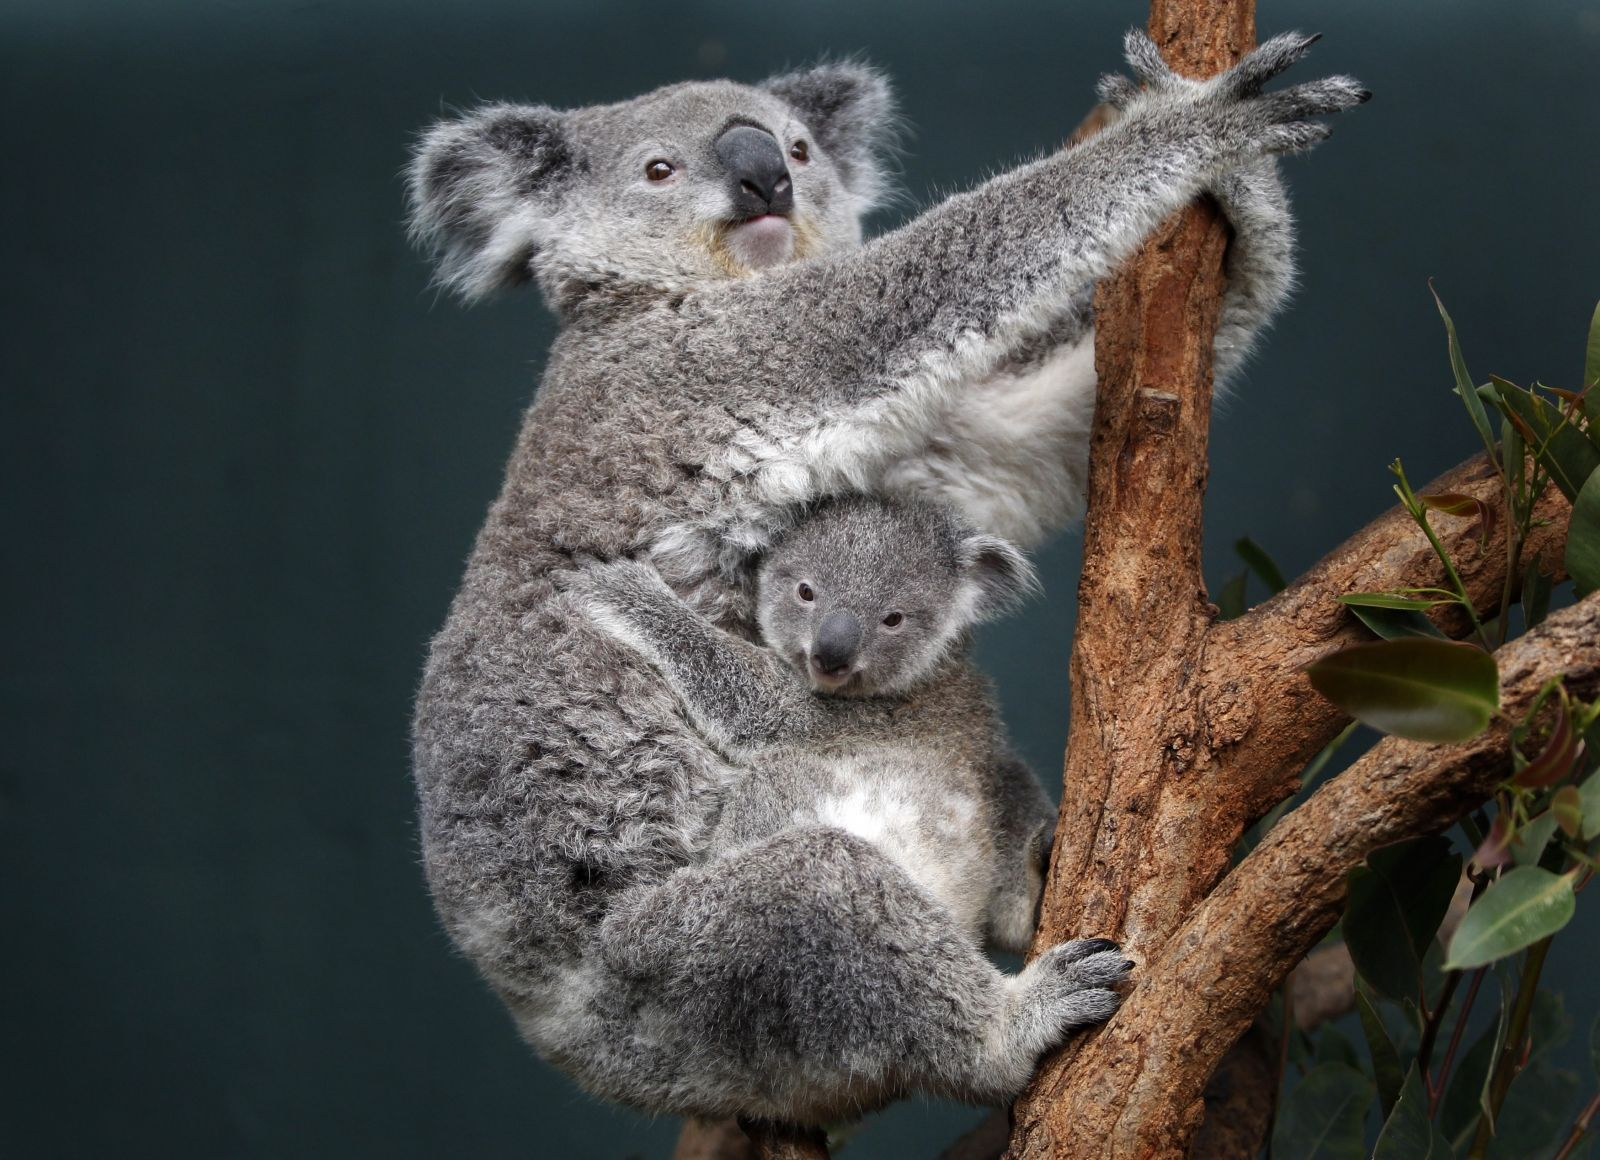 Female koalas given contraceptive implant